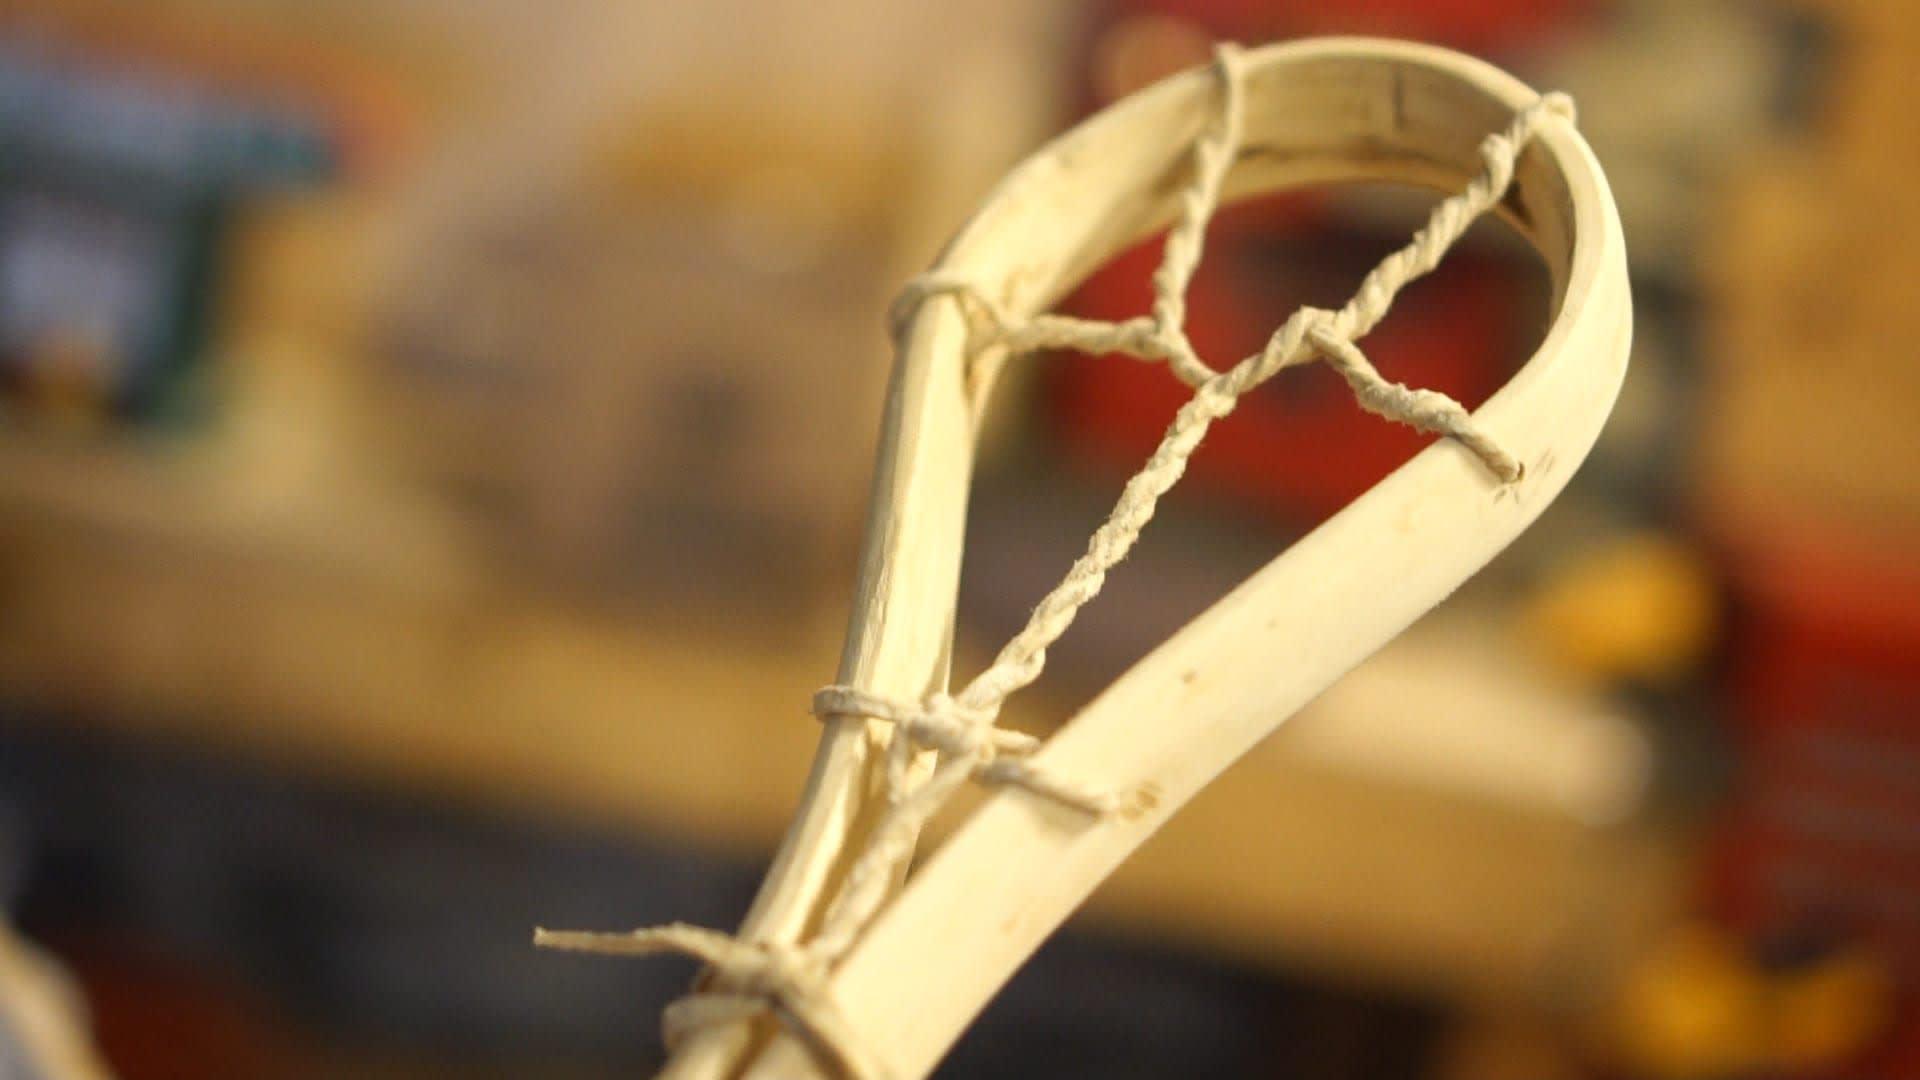 Czech Republic Wooden Lacrosse Stick Richard Kliment